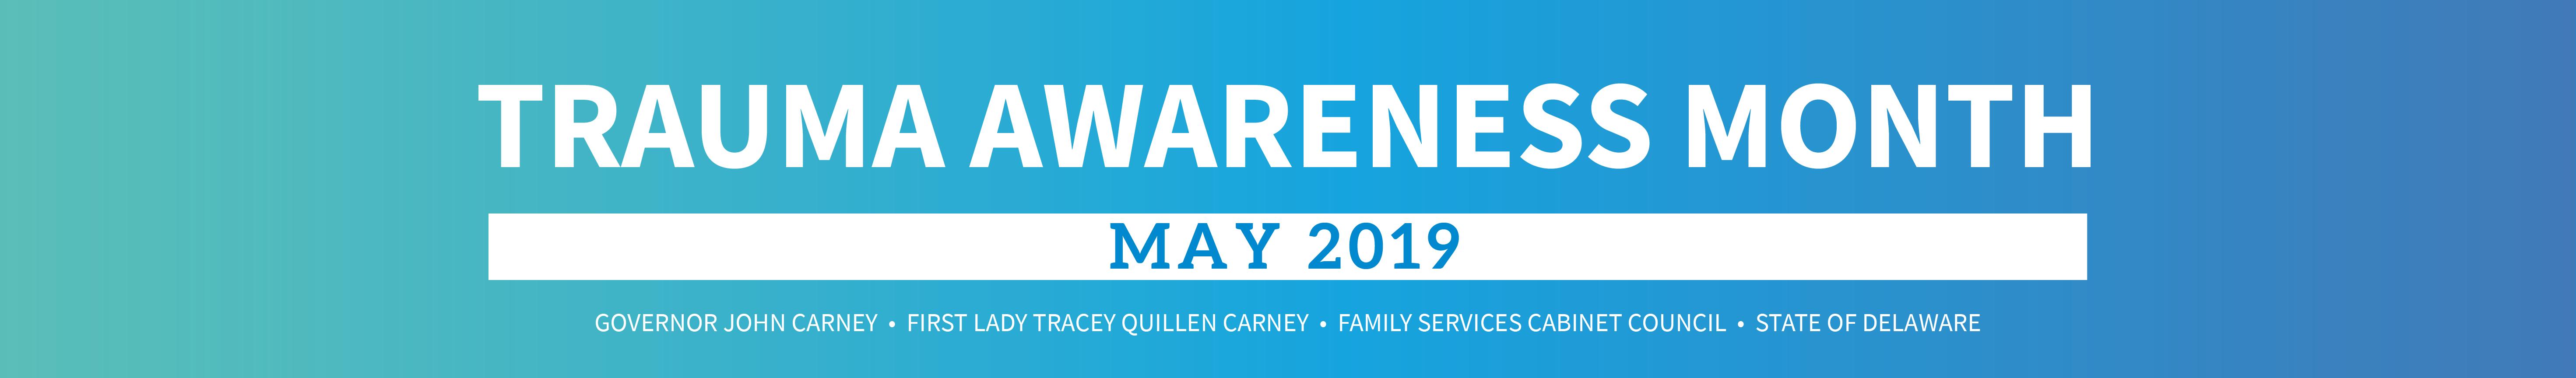 Trauma Awareness Month - Governor John Carney - State of